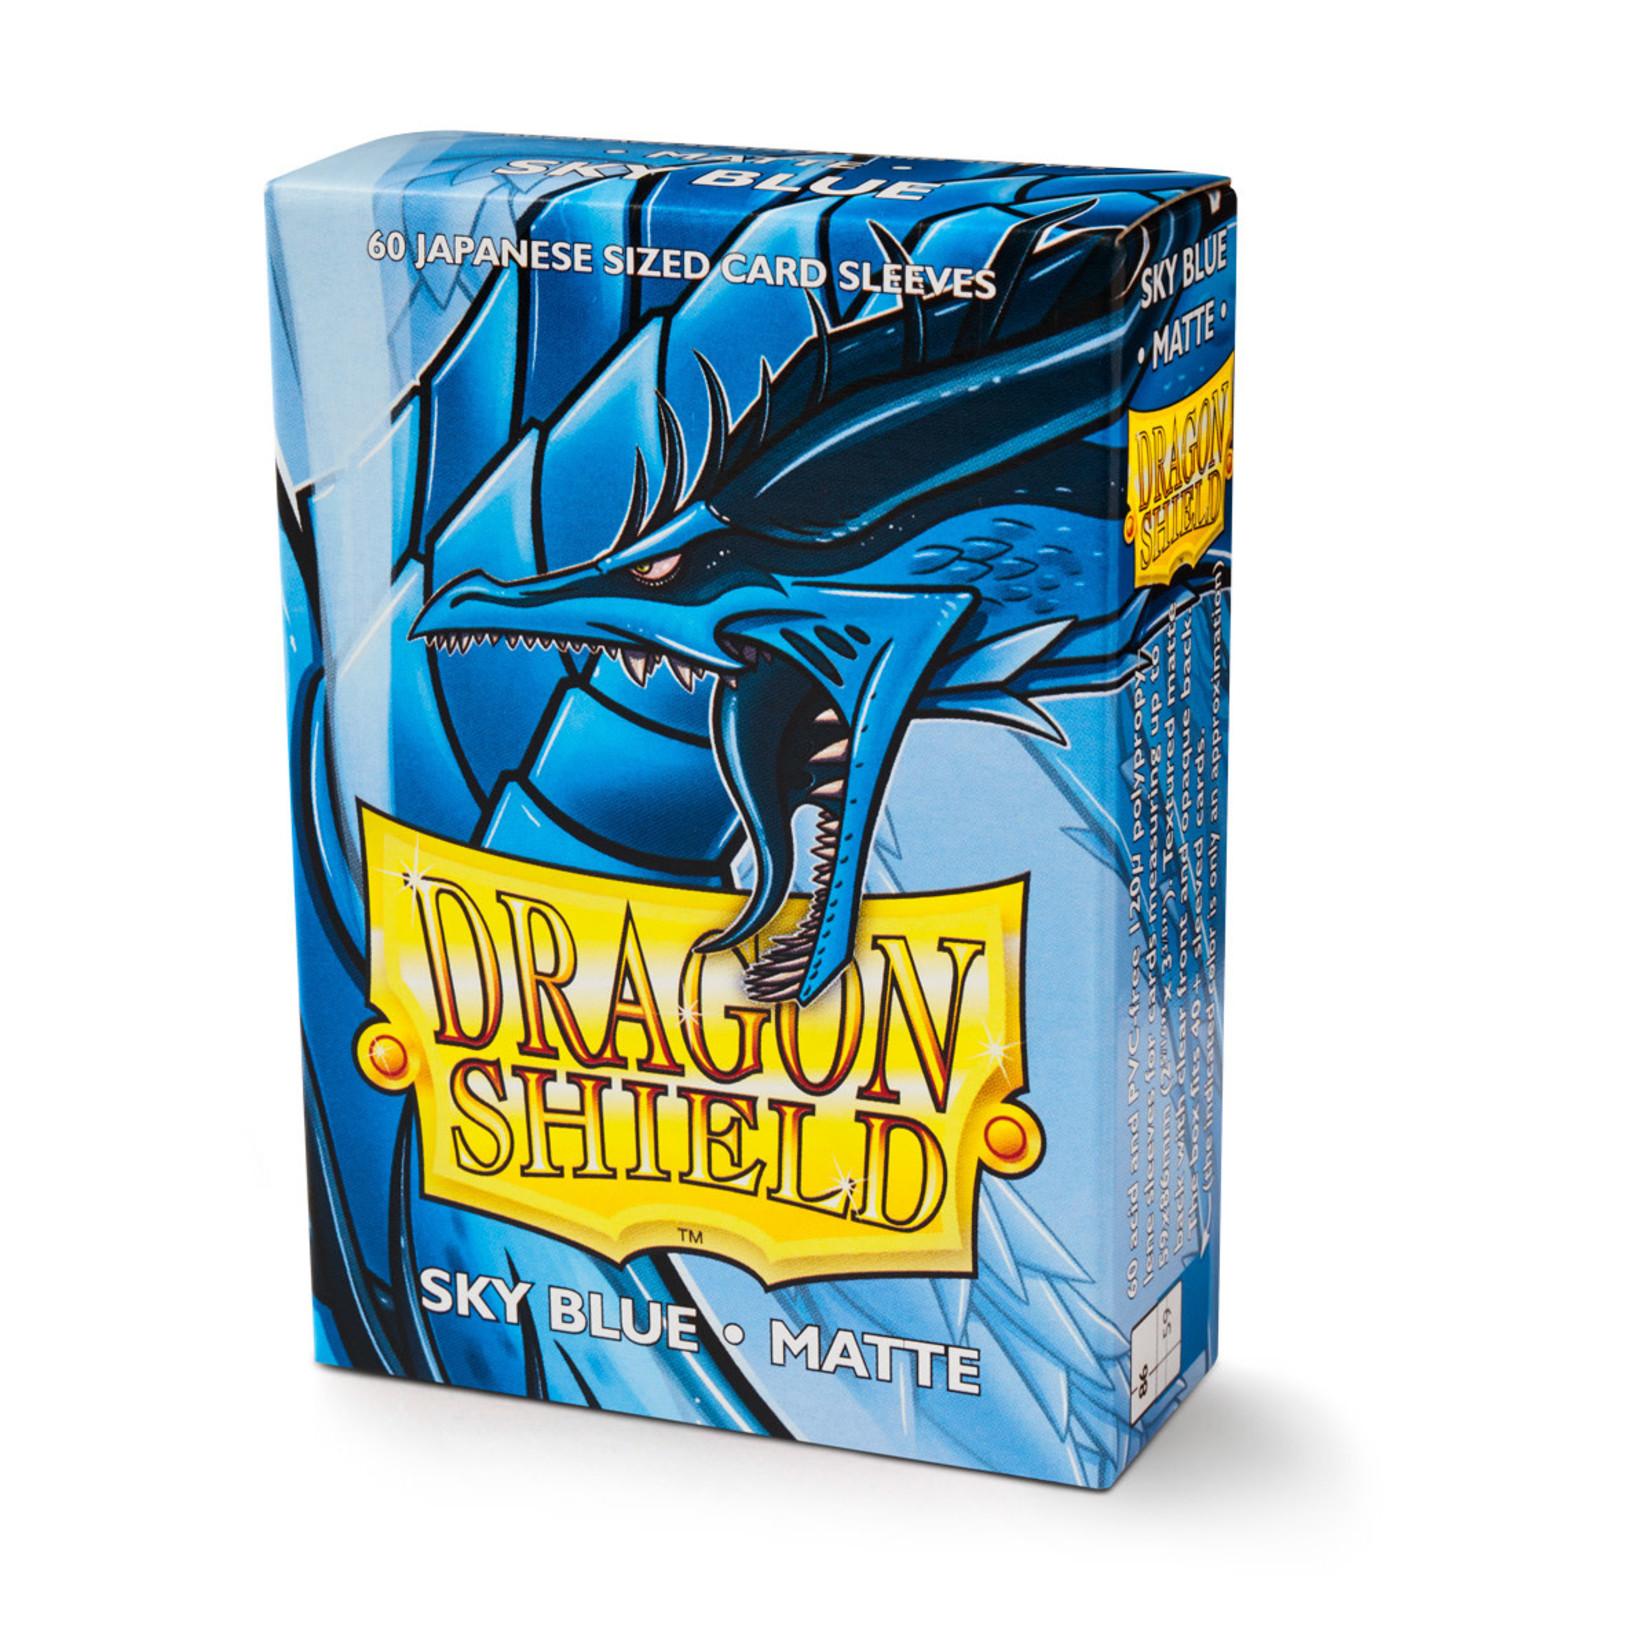 Arcane Tinmen Dragon Shield Mini/Japanese Matte Sky Blue